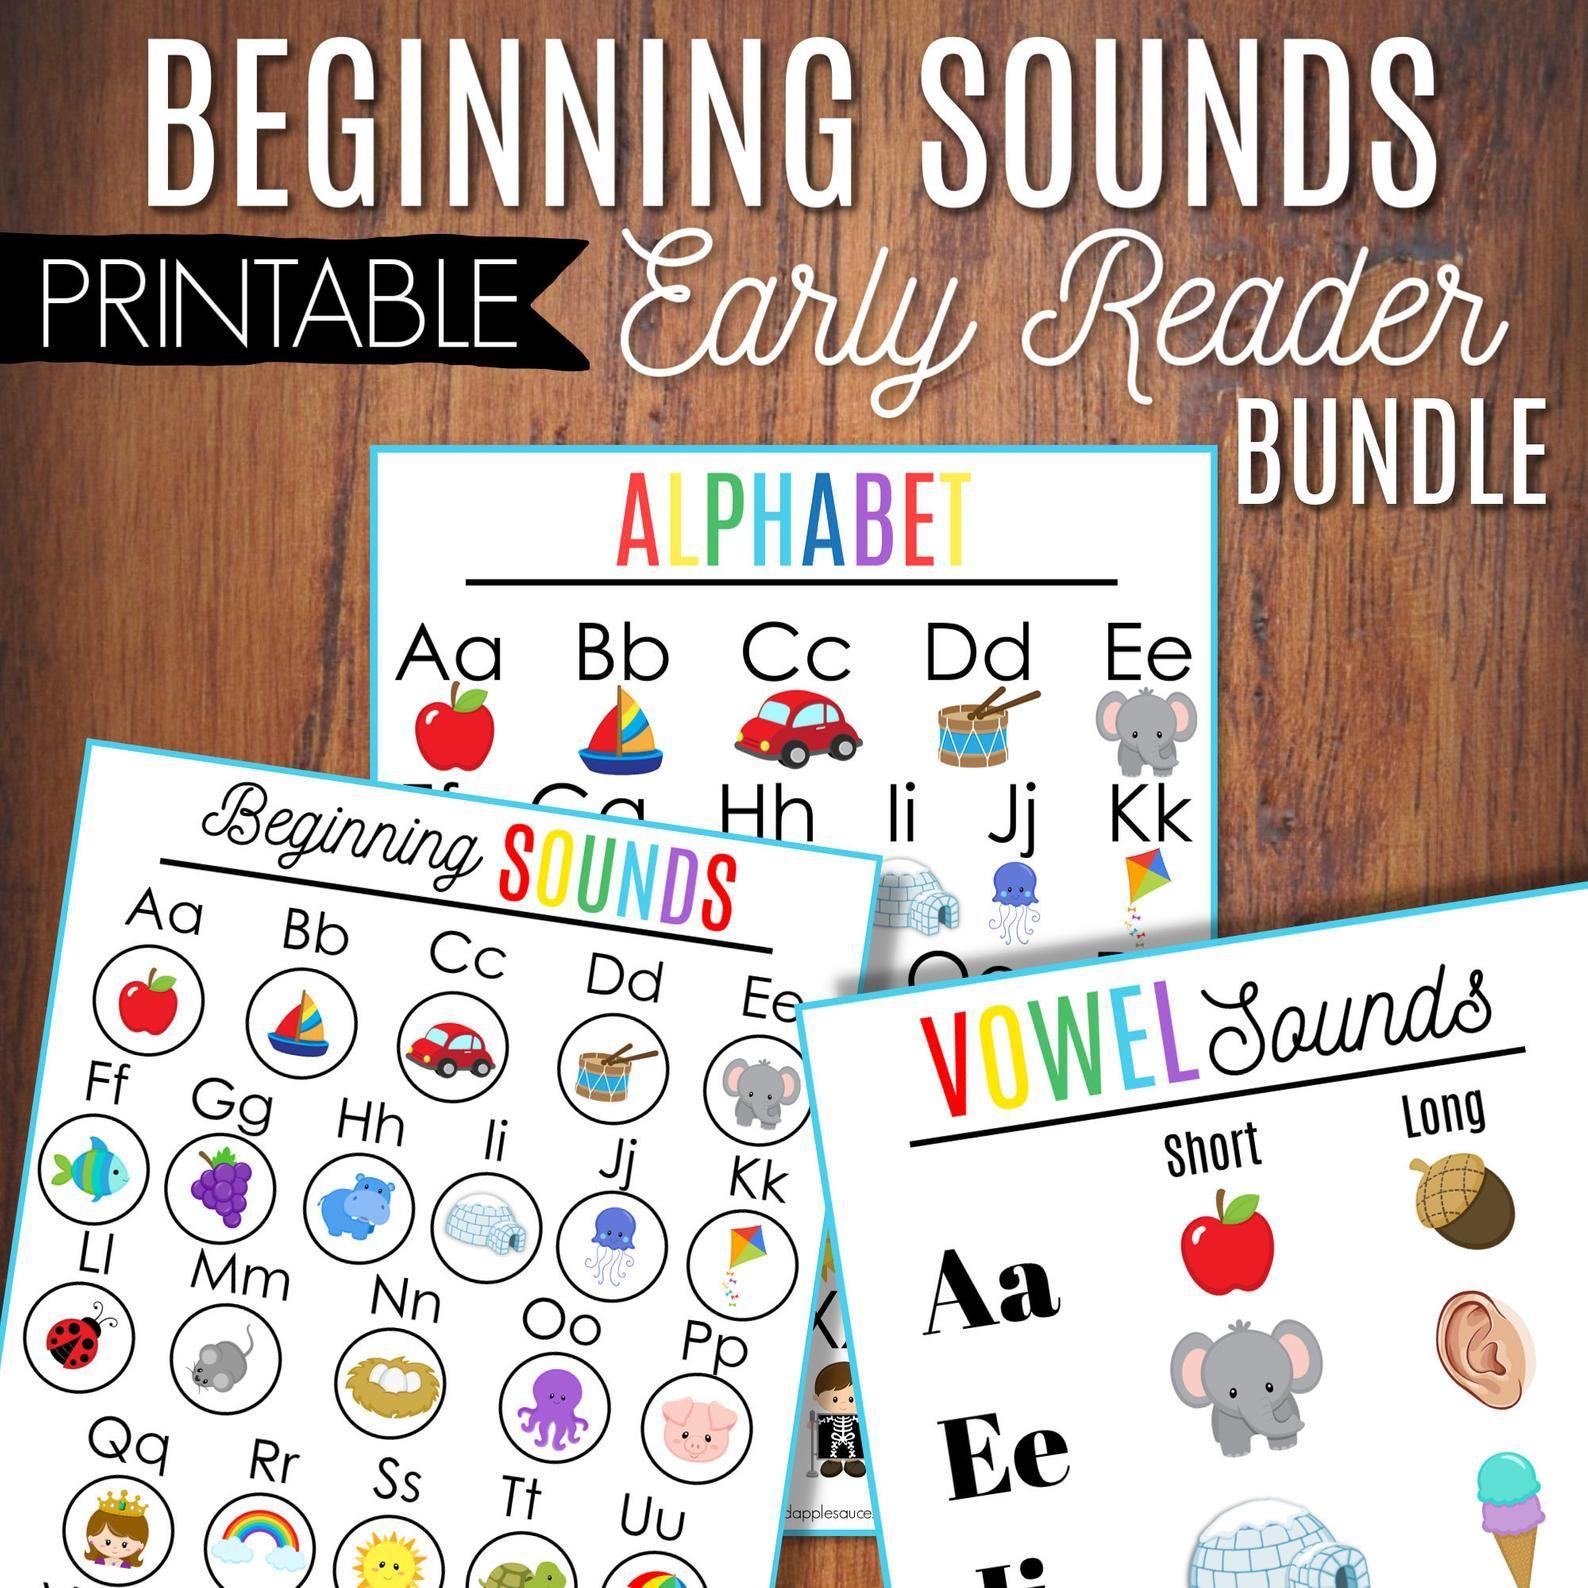 Beginning Sounds Alphabet Practice Vowel Sounds Classroom